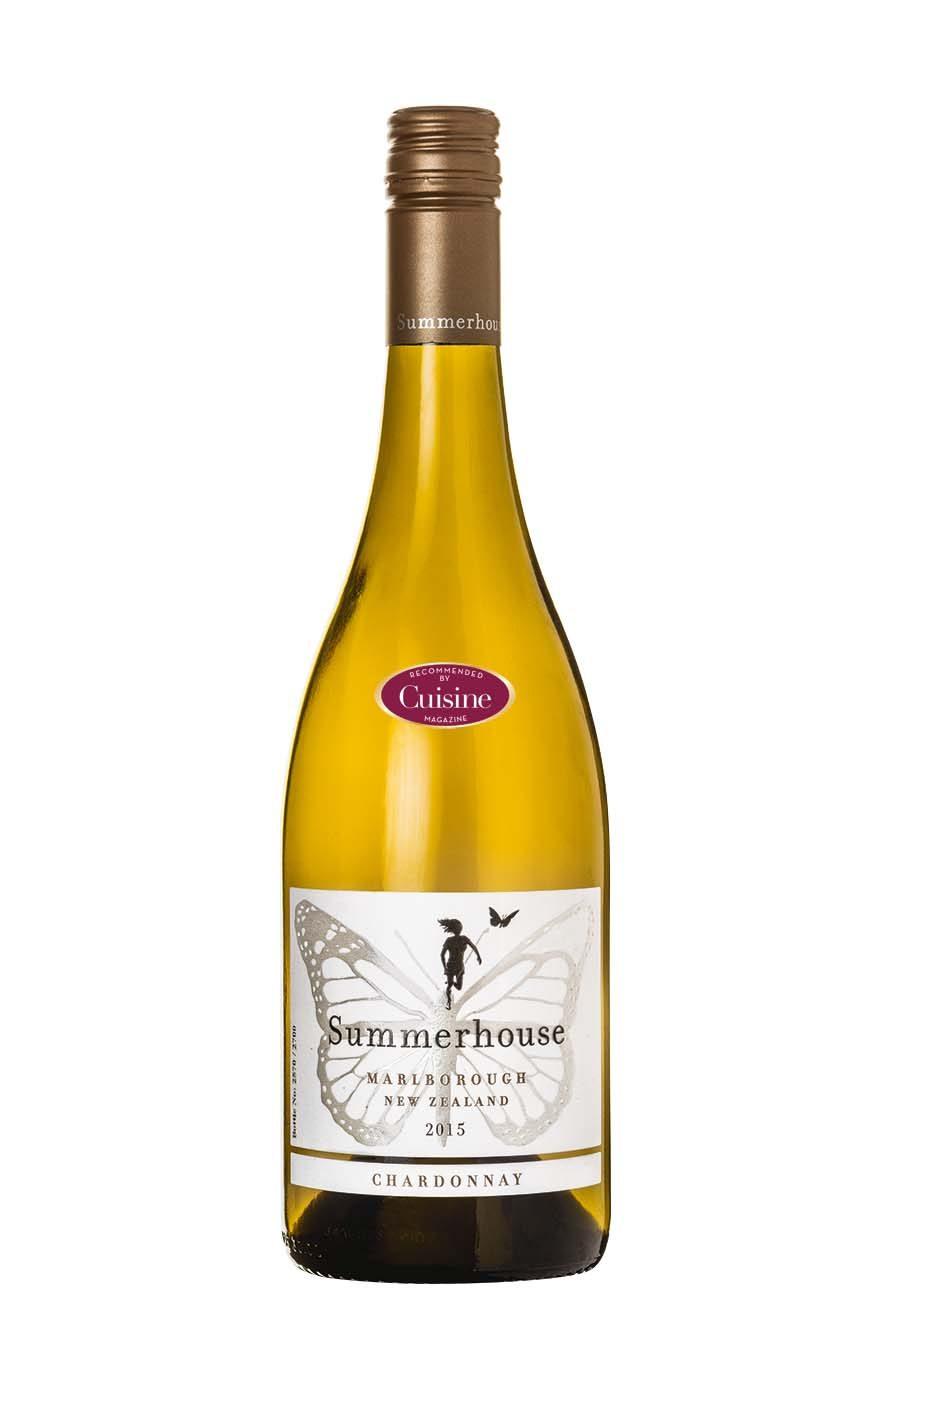 Summerhouse Marlborough Chardonnay 2015